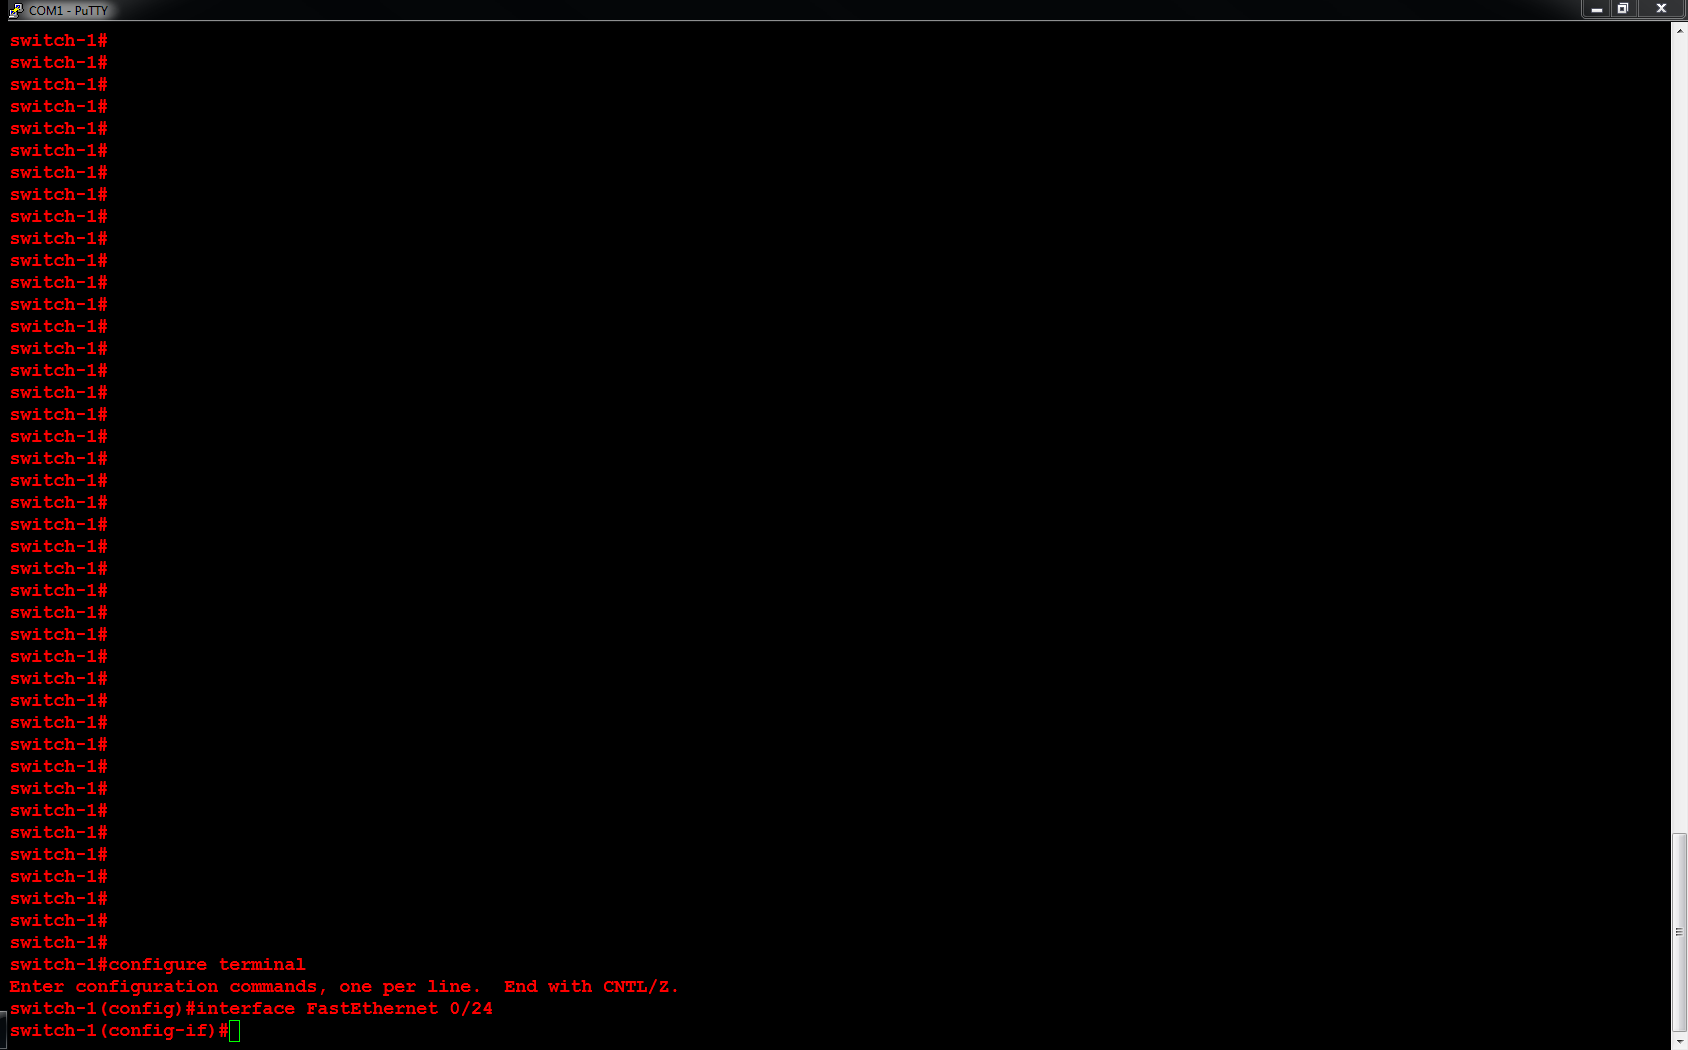 Cisco - Configure Cisco 3560 Switch Trunk Port - 00